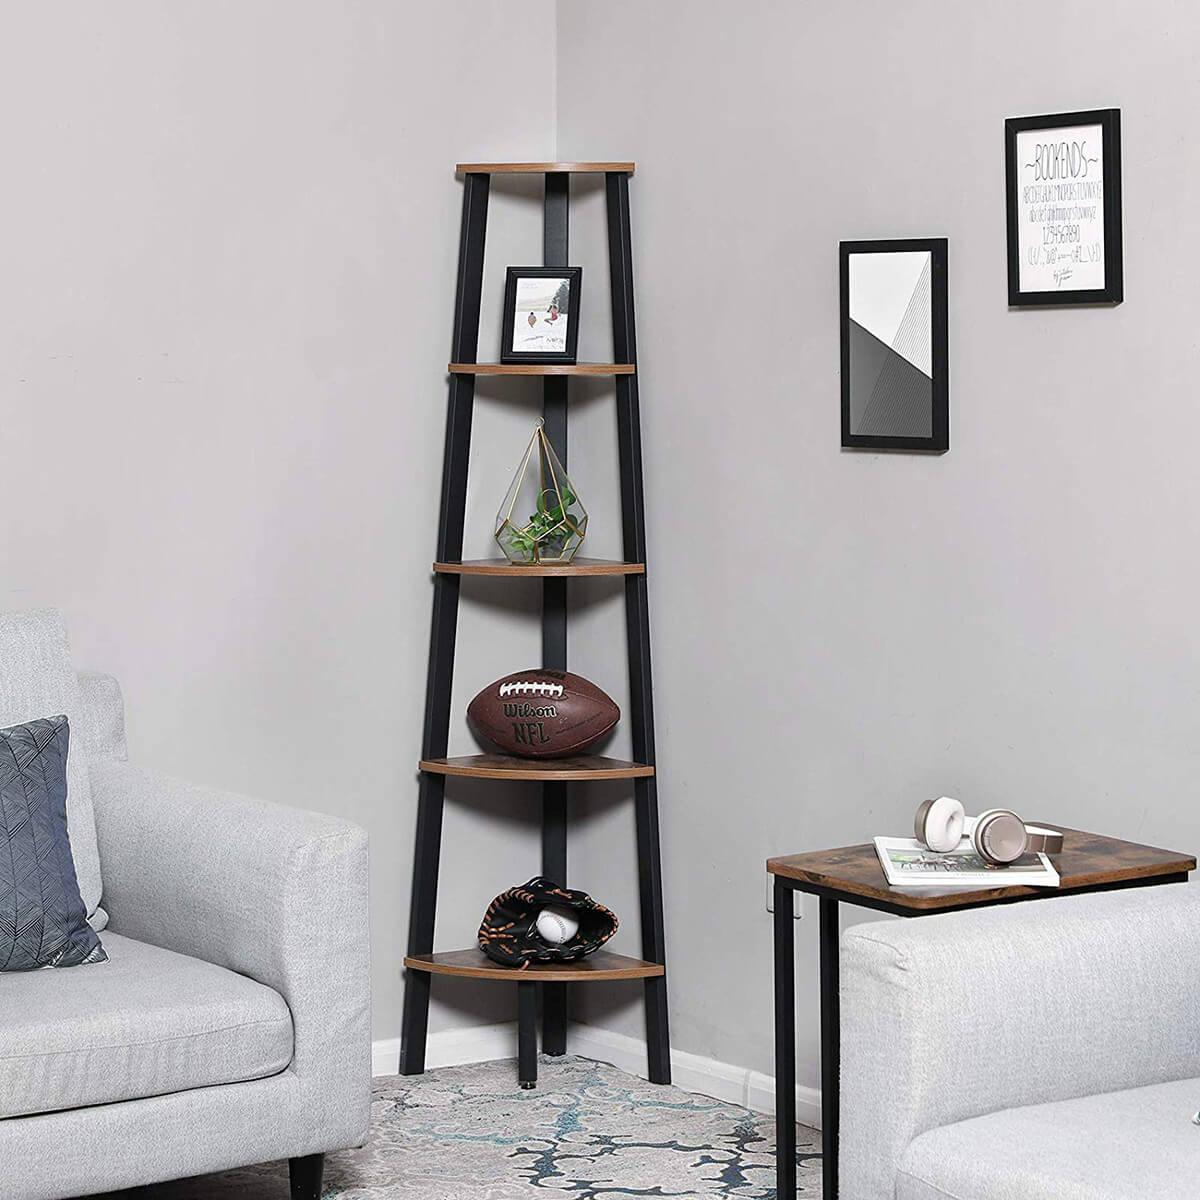 26 Best Corner Shelf Ideas And Designs For 2019